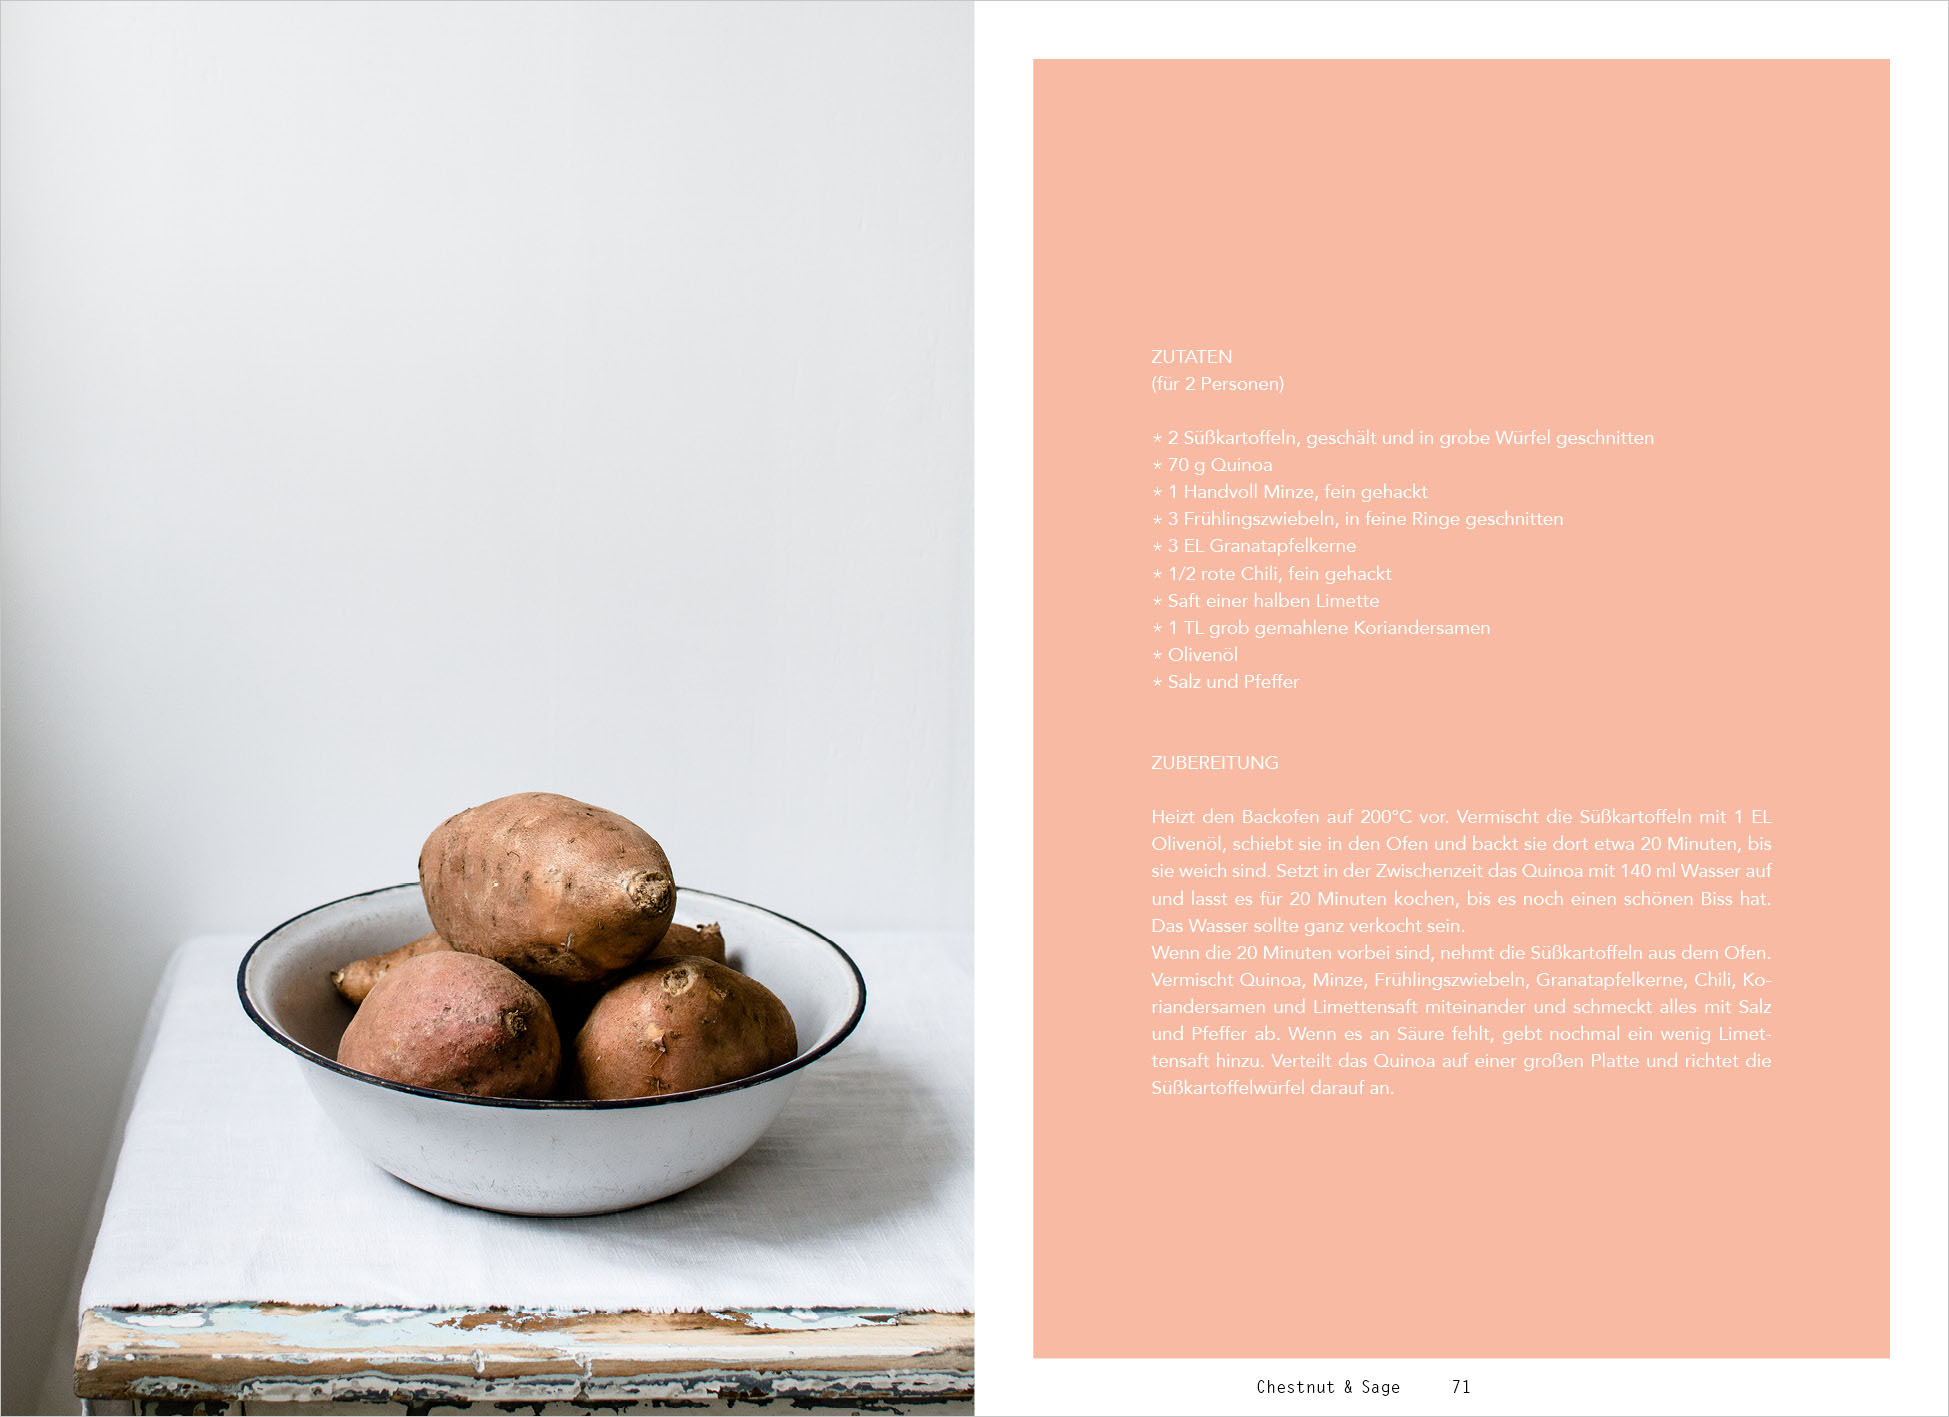 archiv/e Magazin |chestnut&sage